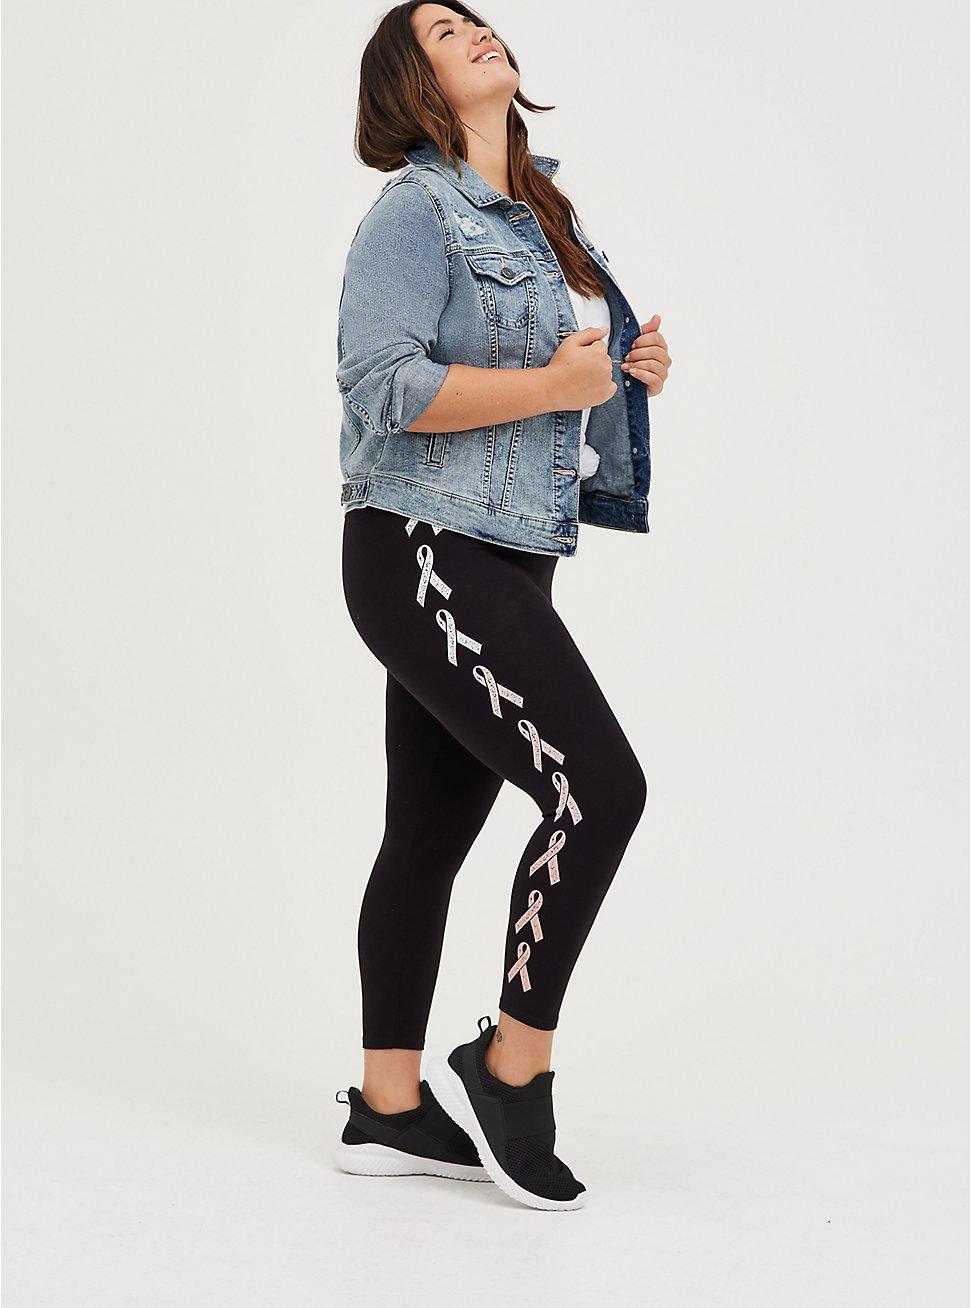 Breast Cancer Awareness Premium Legging - Gradient Ribbon Side Black, BLACK, hi-res